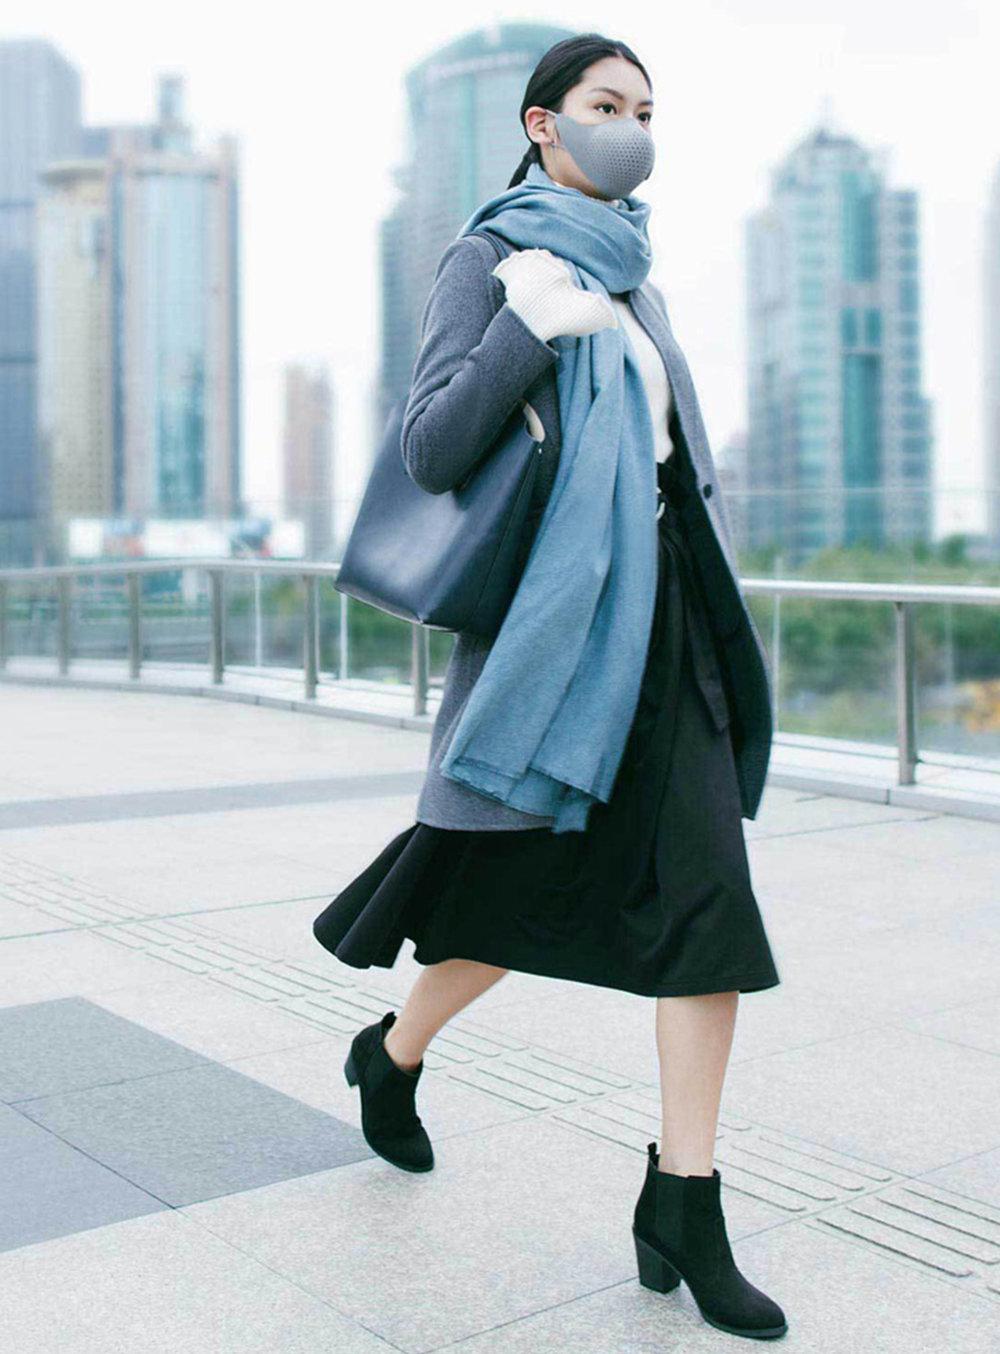 Airwear_Woman.jpg